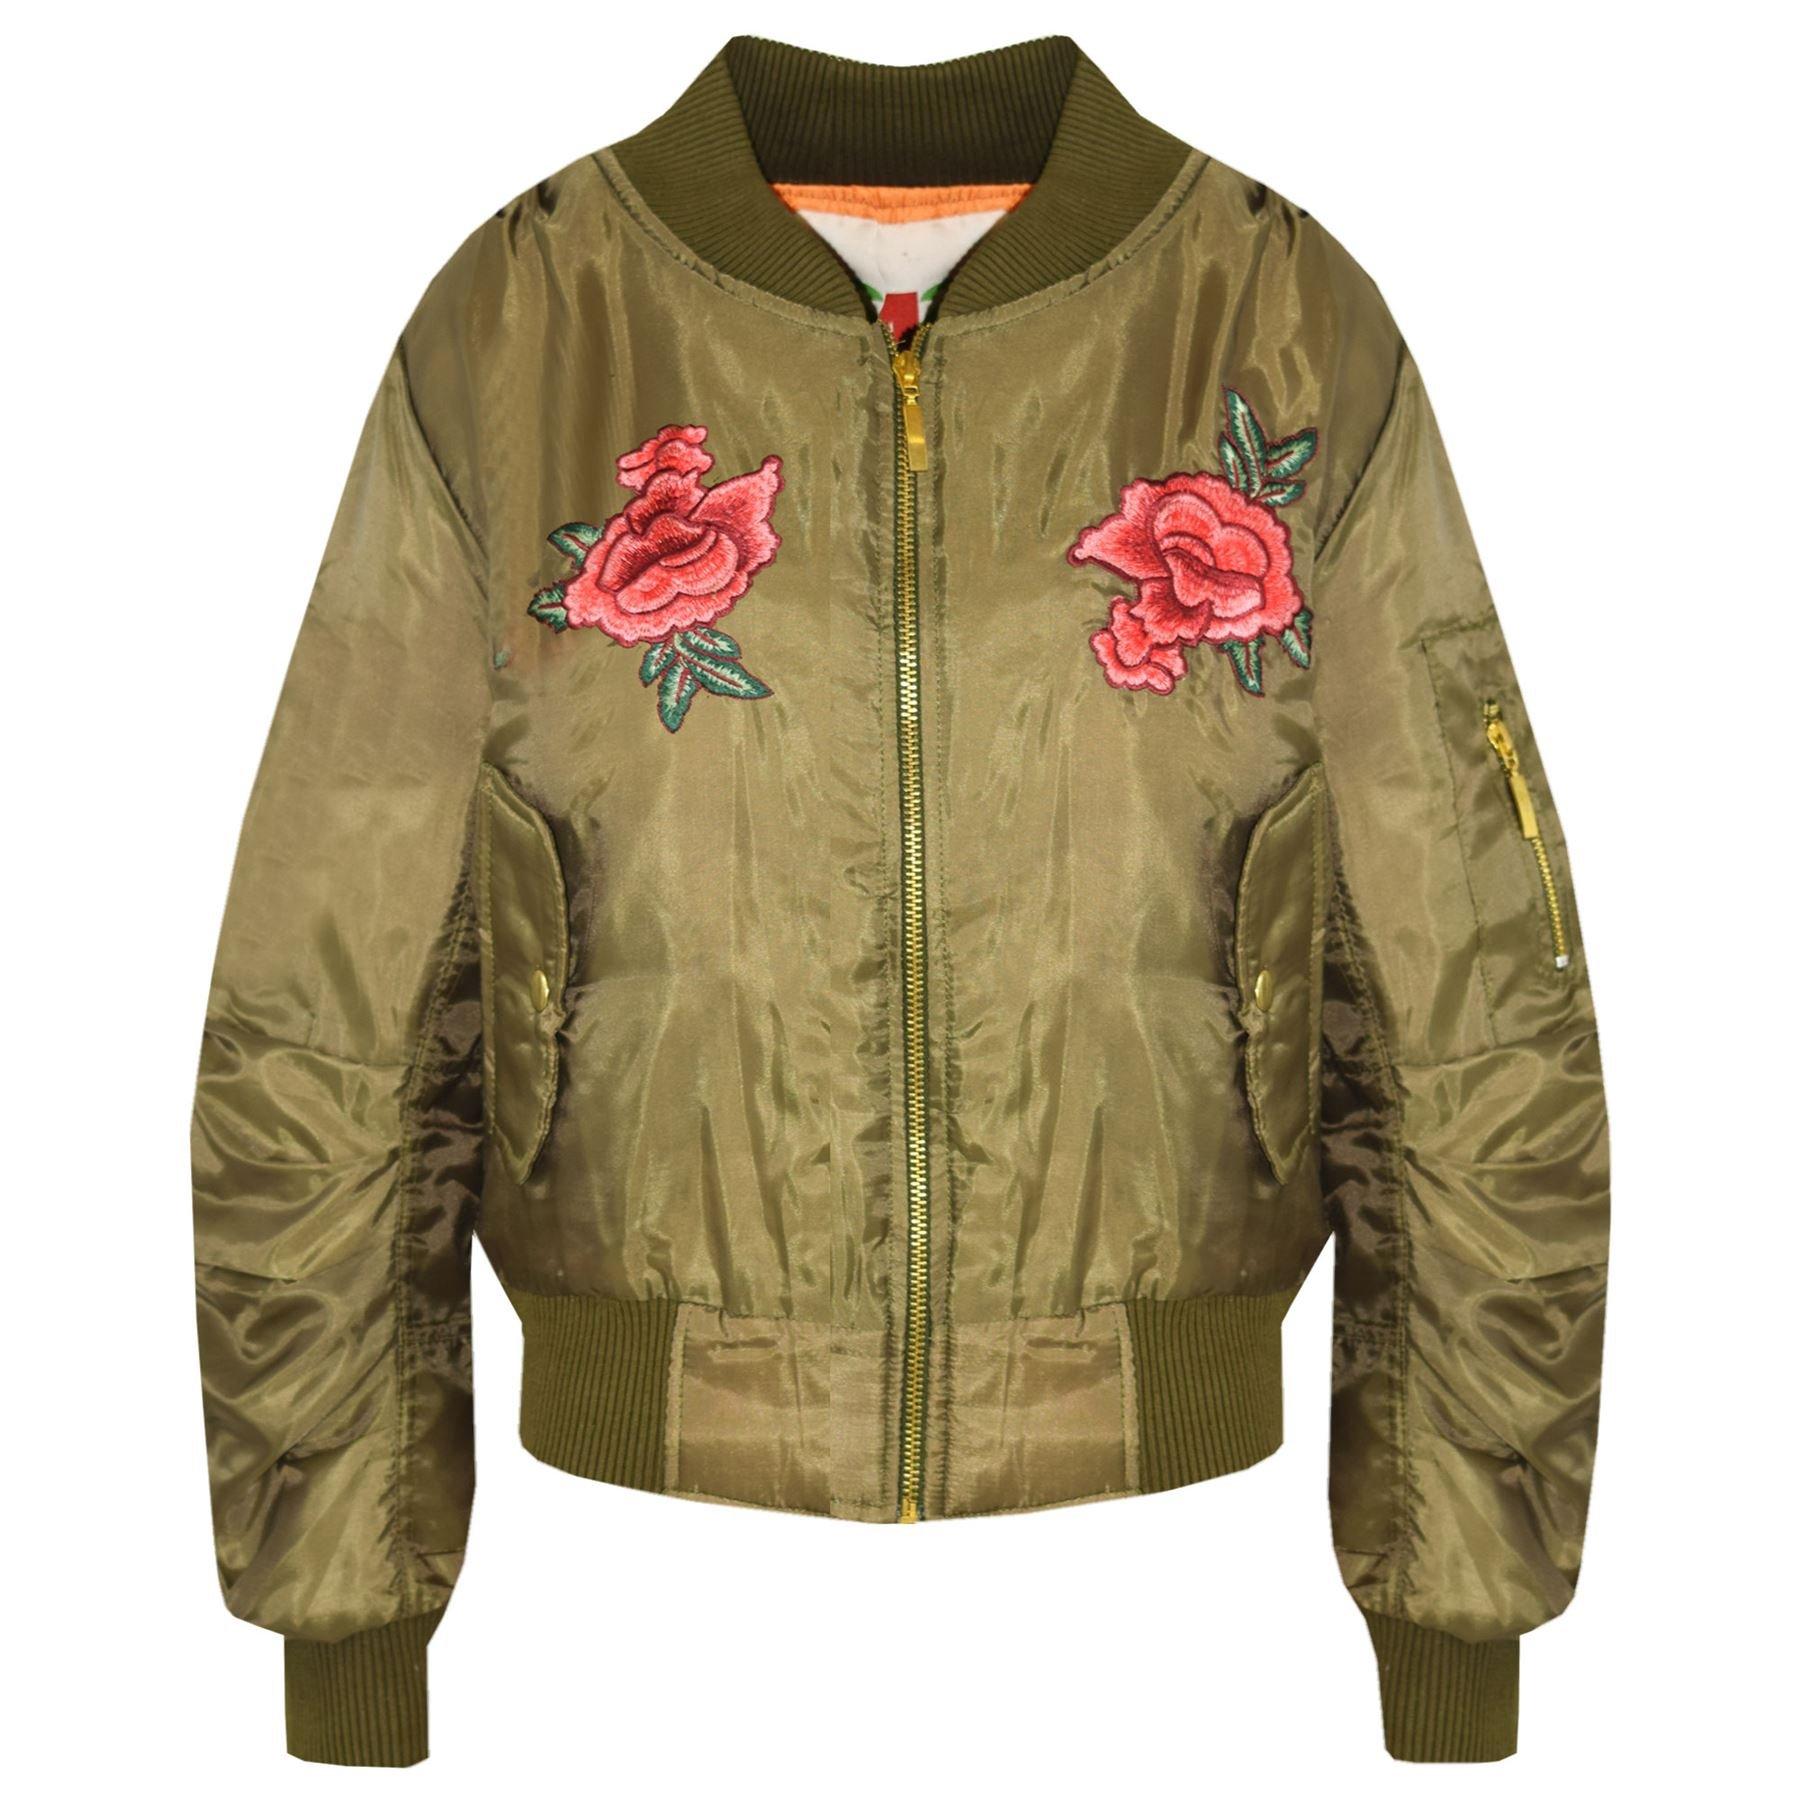 A2Z 4 Kids® Girls Jacket Kids Roses Print Bomber Padded Zip Up Biker Jackets MA1 Coat 5-13 Y by A2Z 4 Kids®